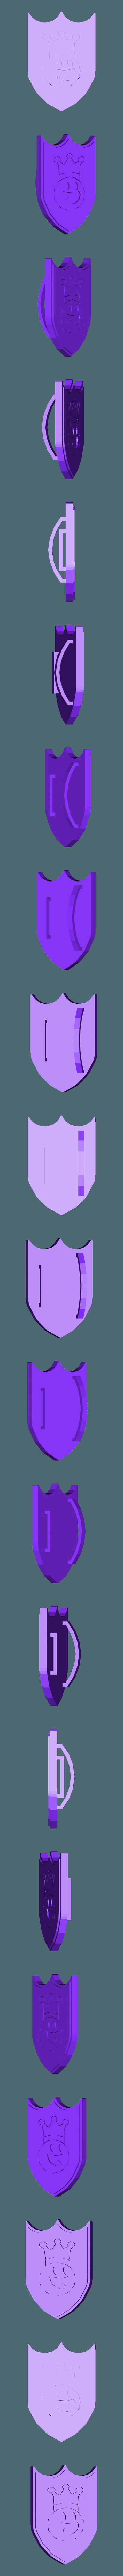 Fun_King_Shield.stl Download free STL file FUN KING 3D CUSTOM SHIELD • 3D printable template, A_SKEWED_VIEW_3D